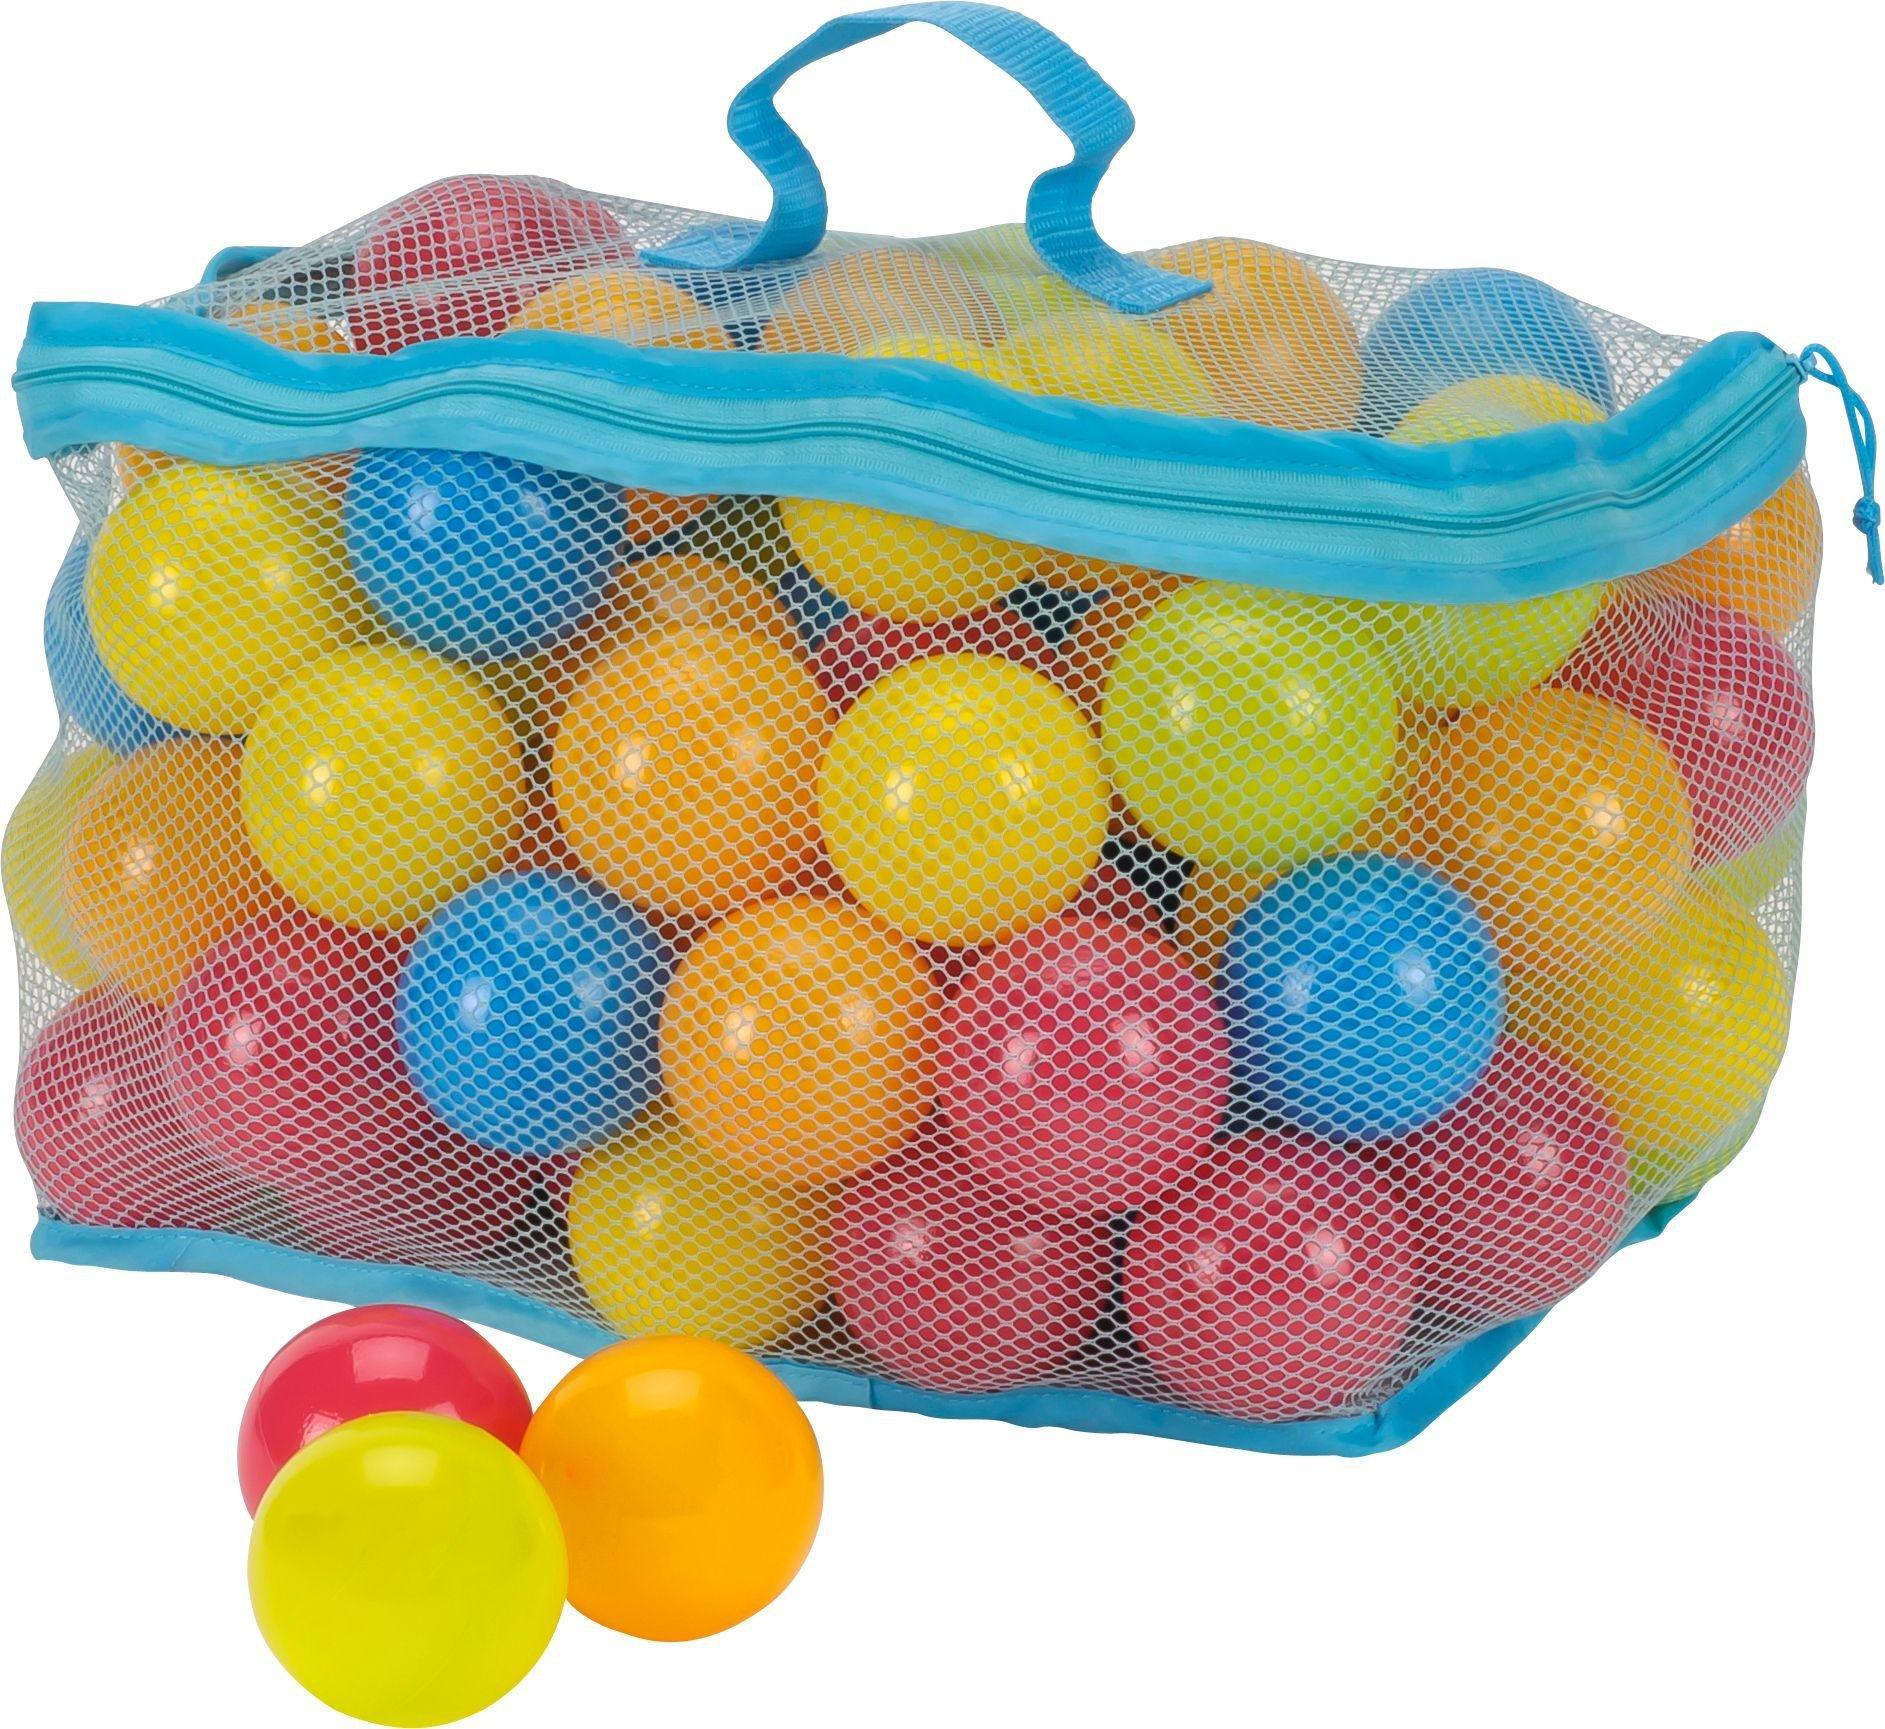 Image result for ball pit balls